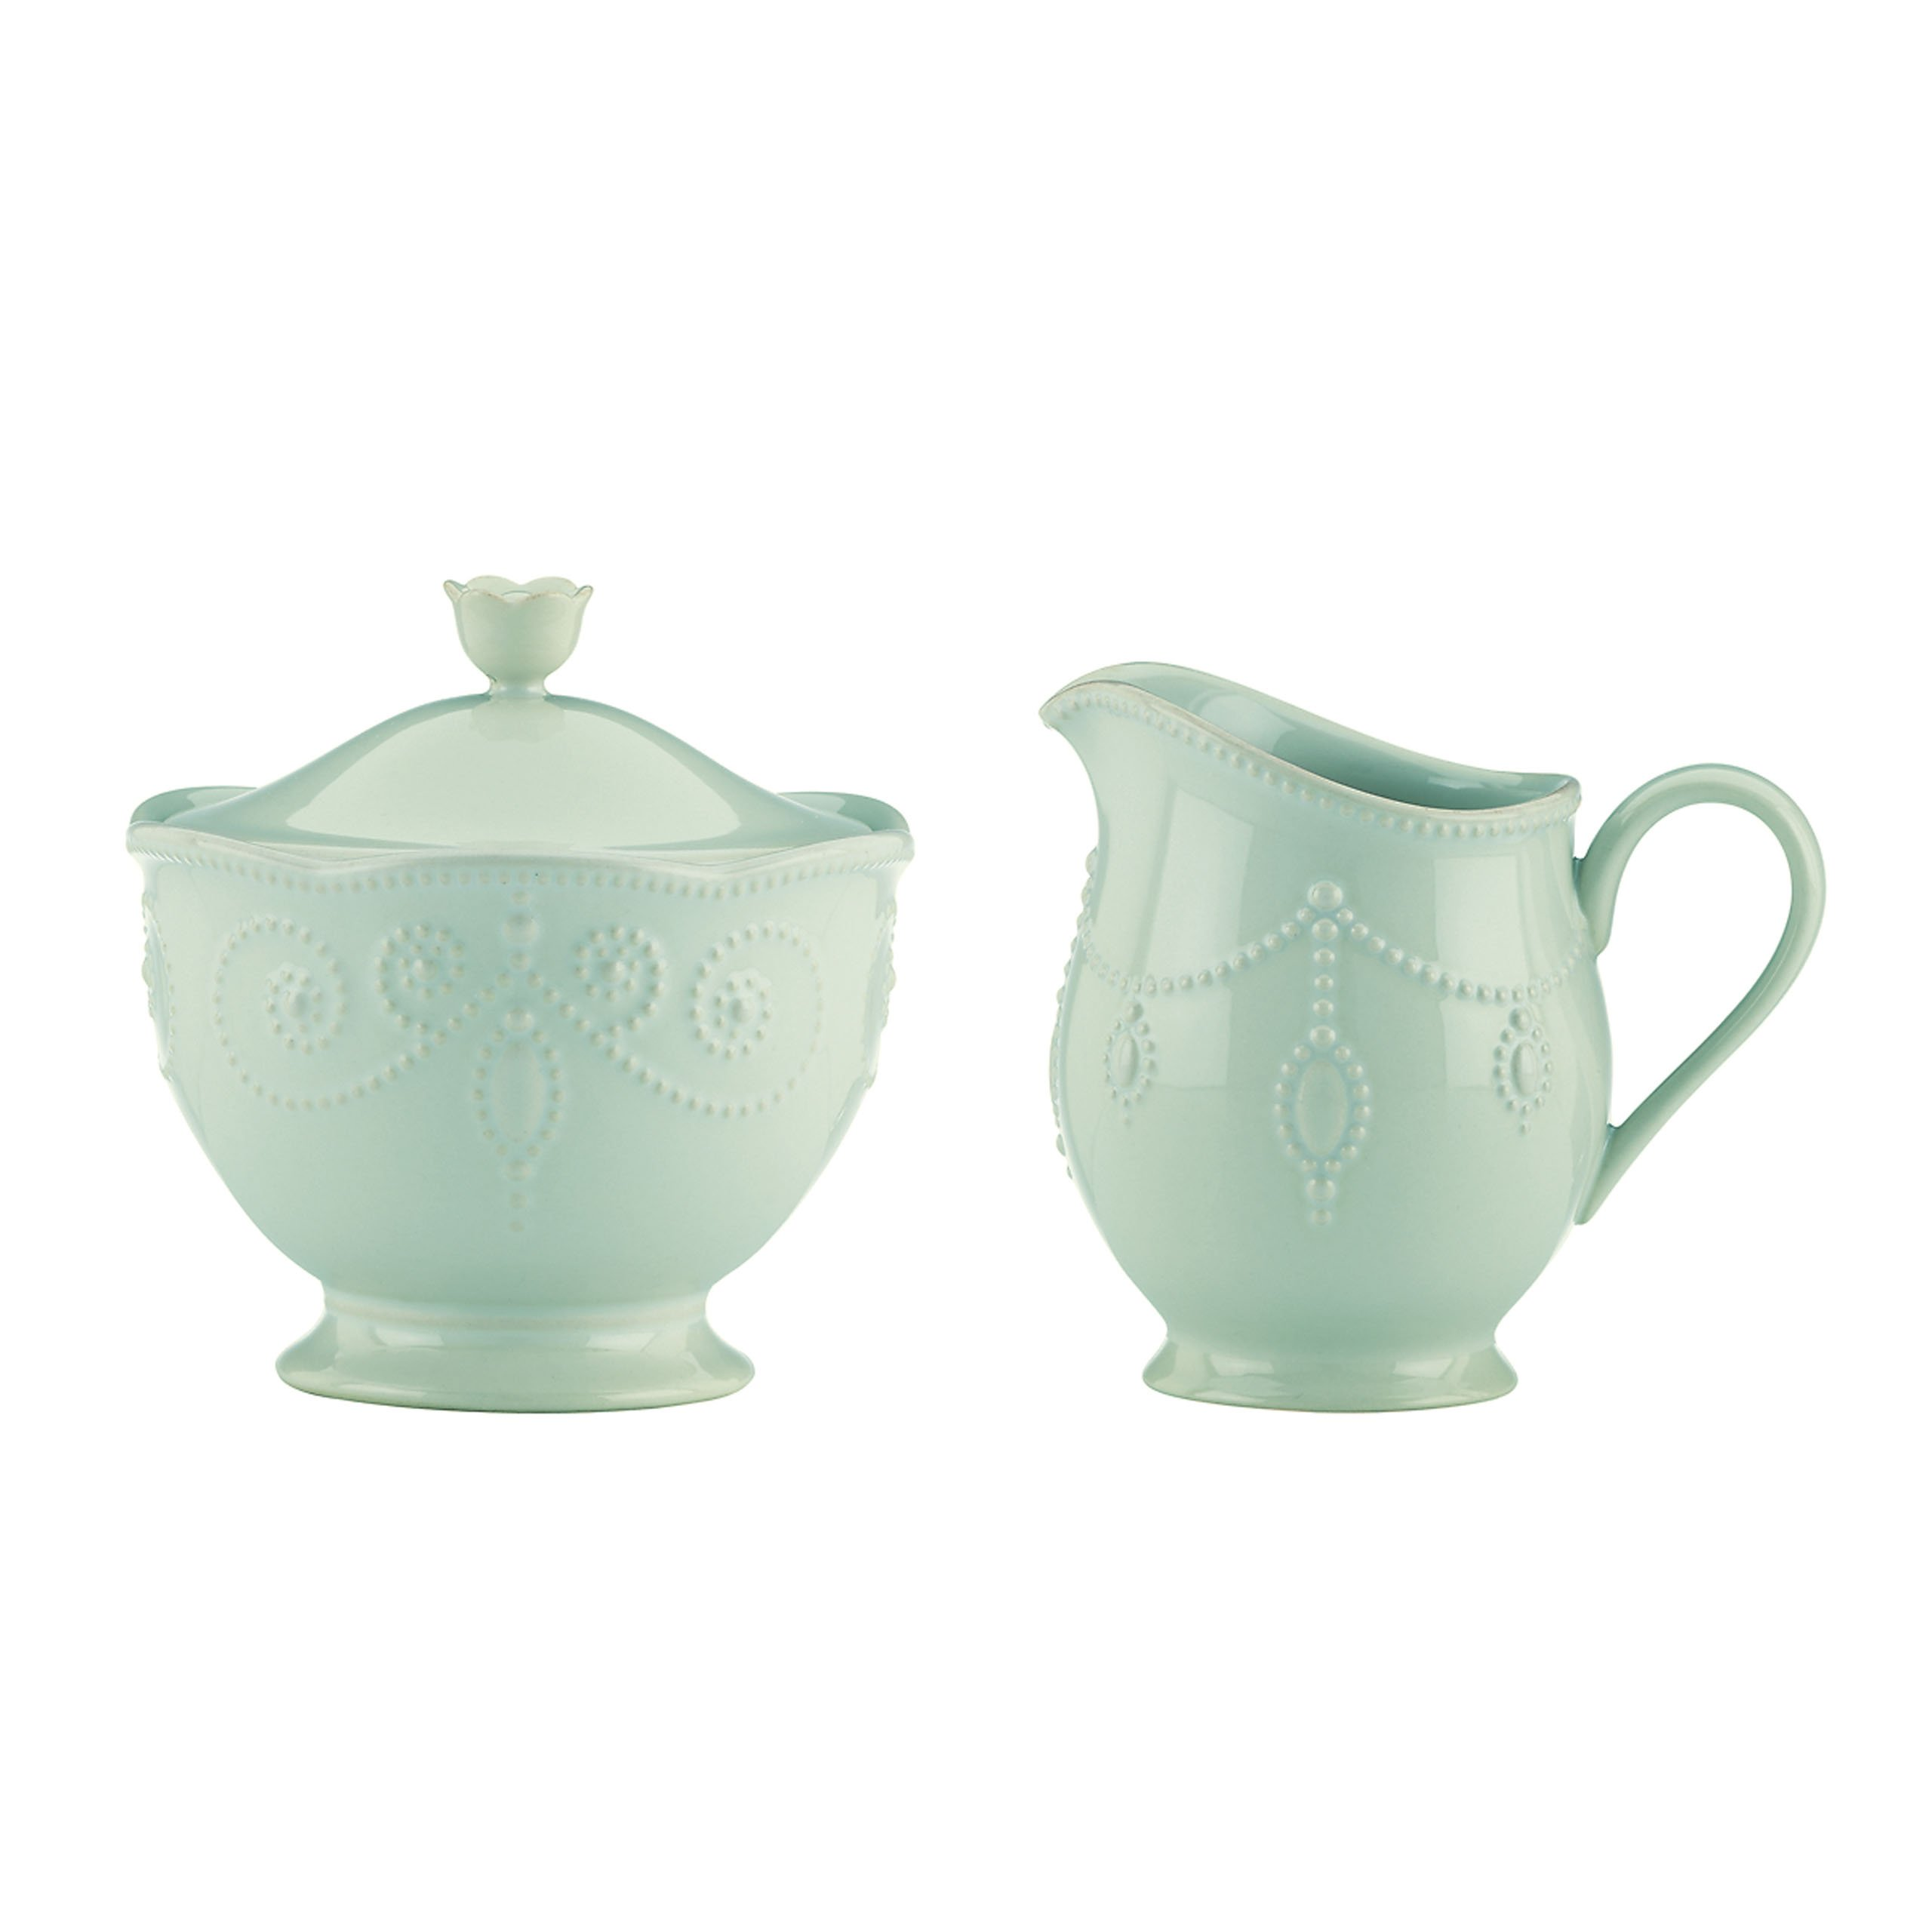 Lenox French Perle Sugar and Creamer Set, Ice Blue - 824408